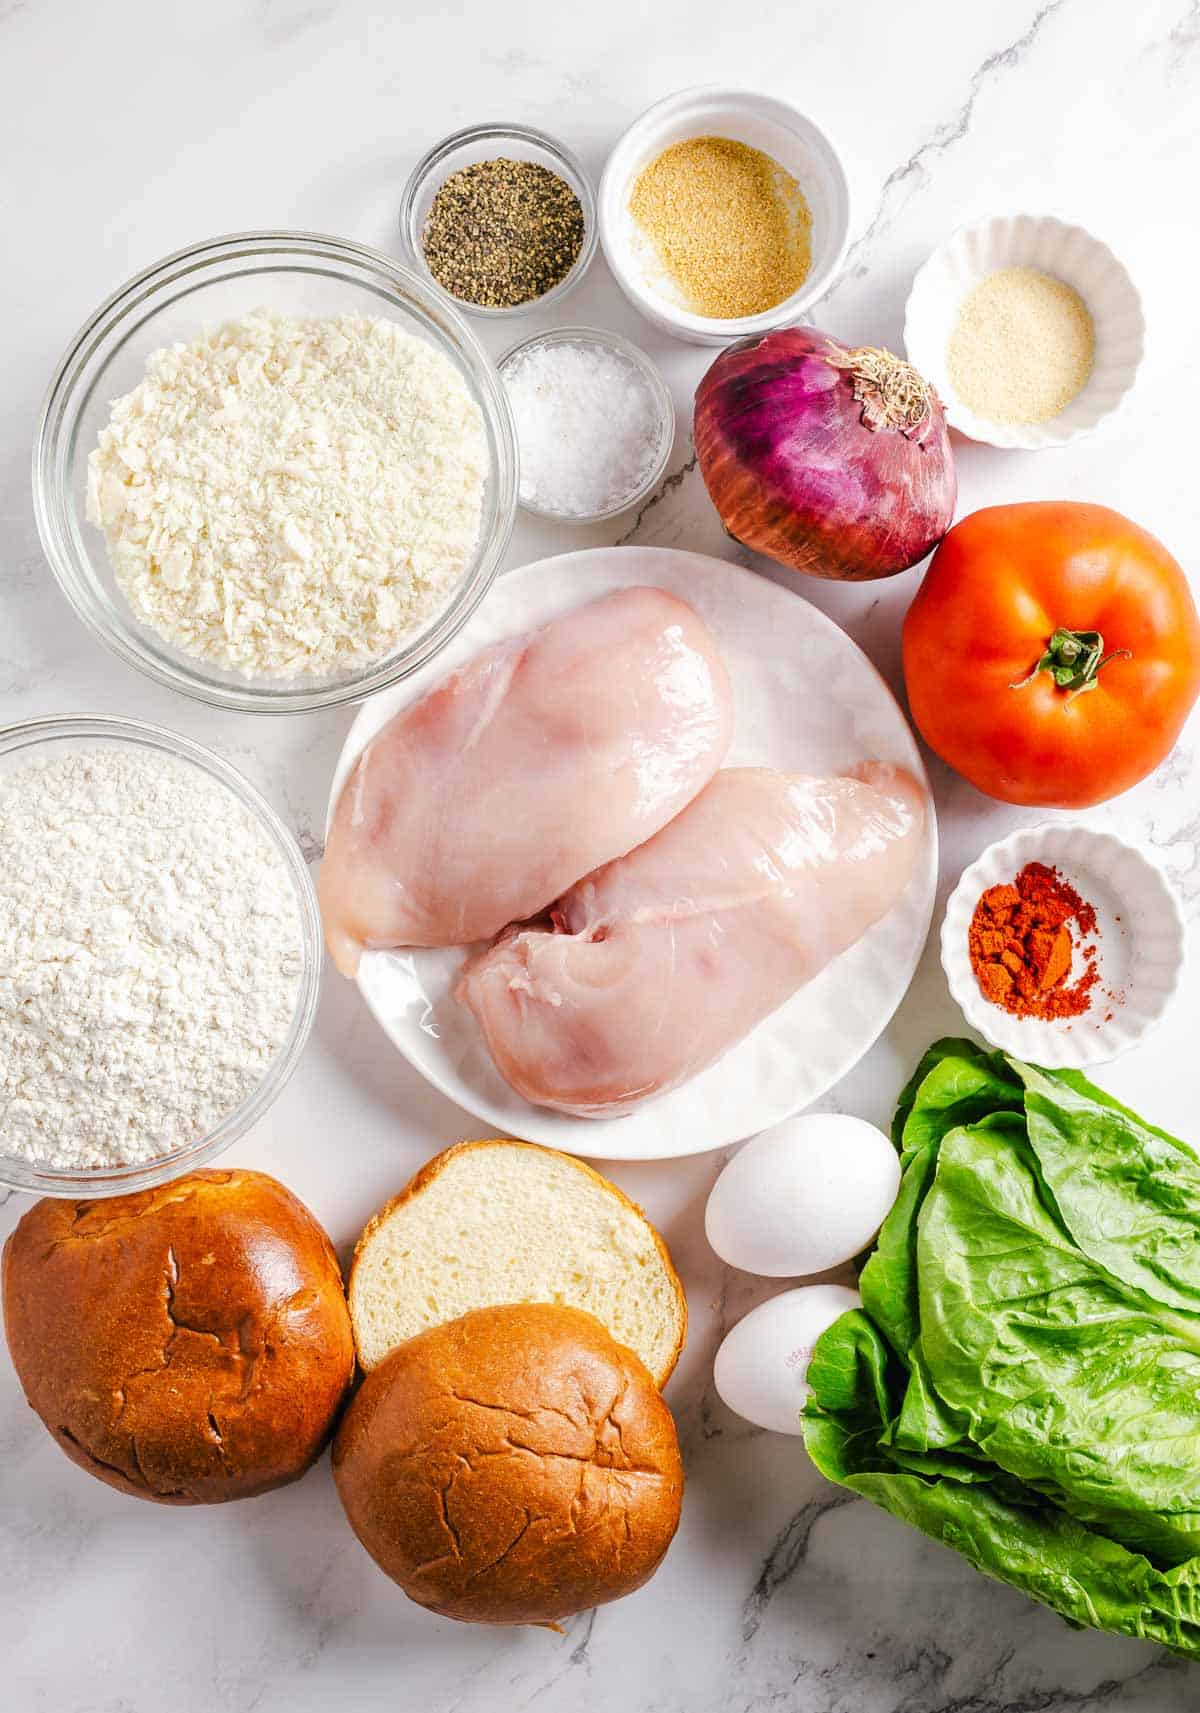 Ingredients needed to make a chicken burger.